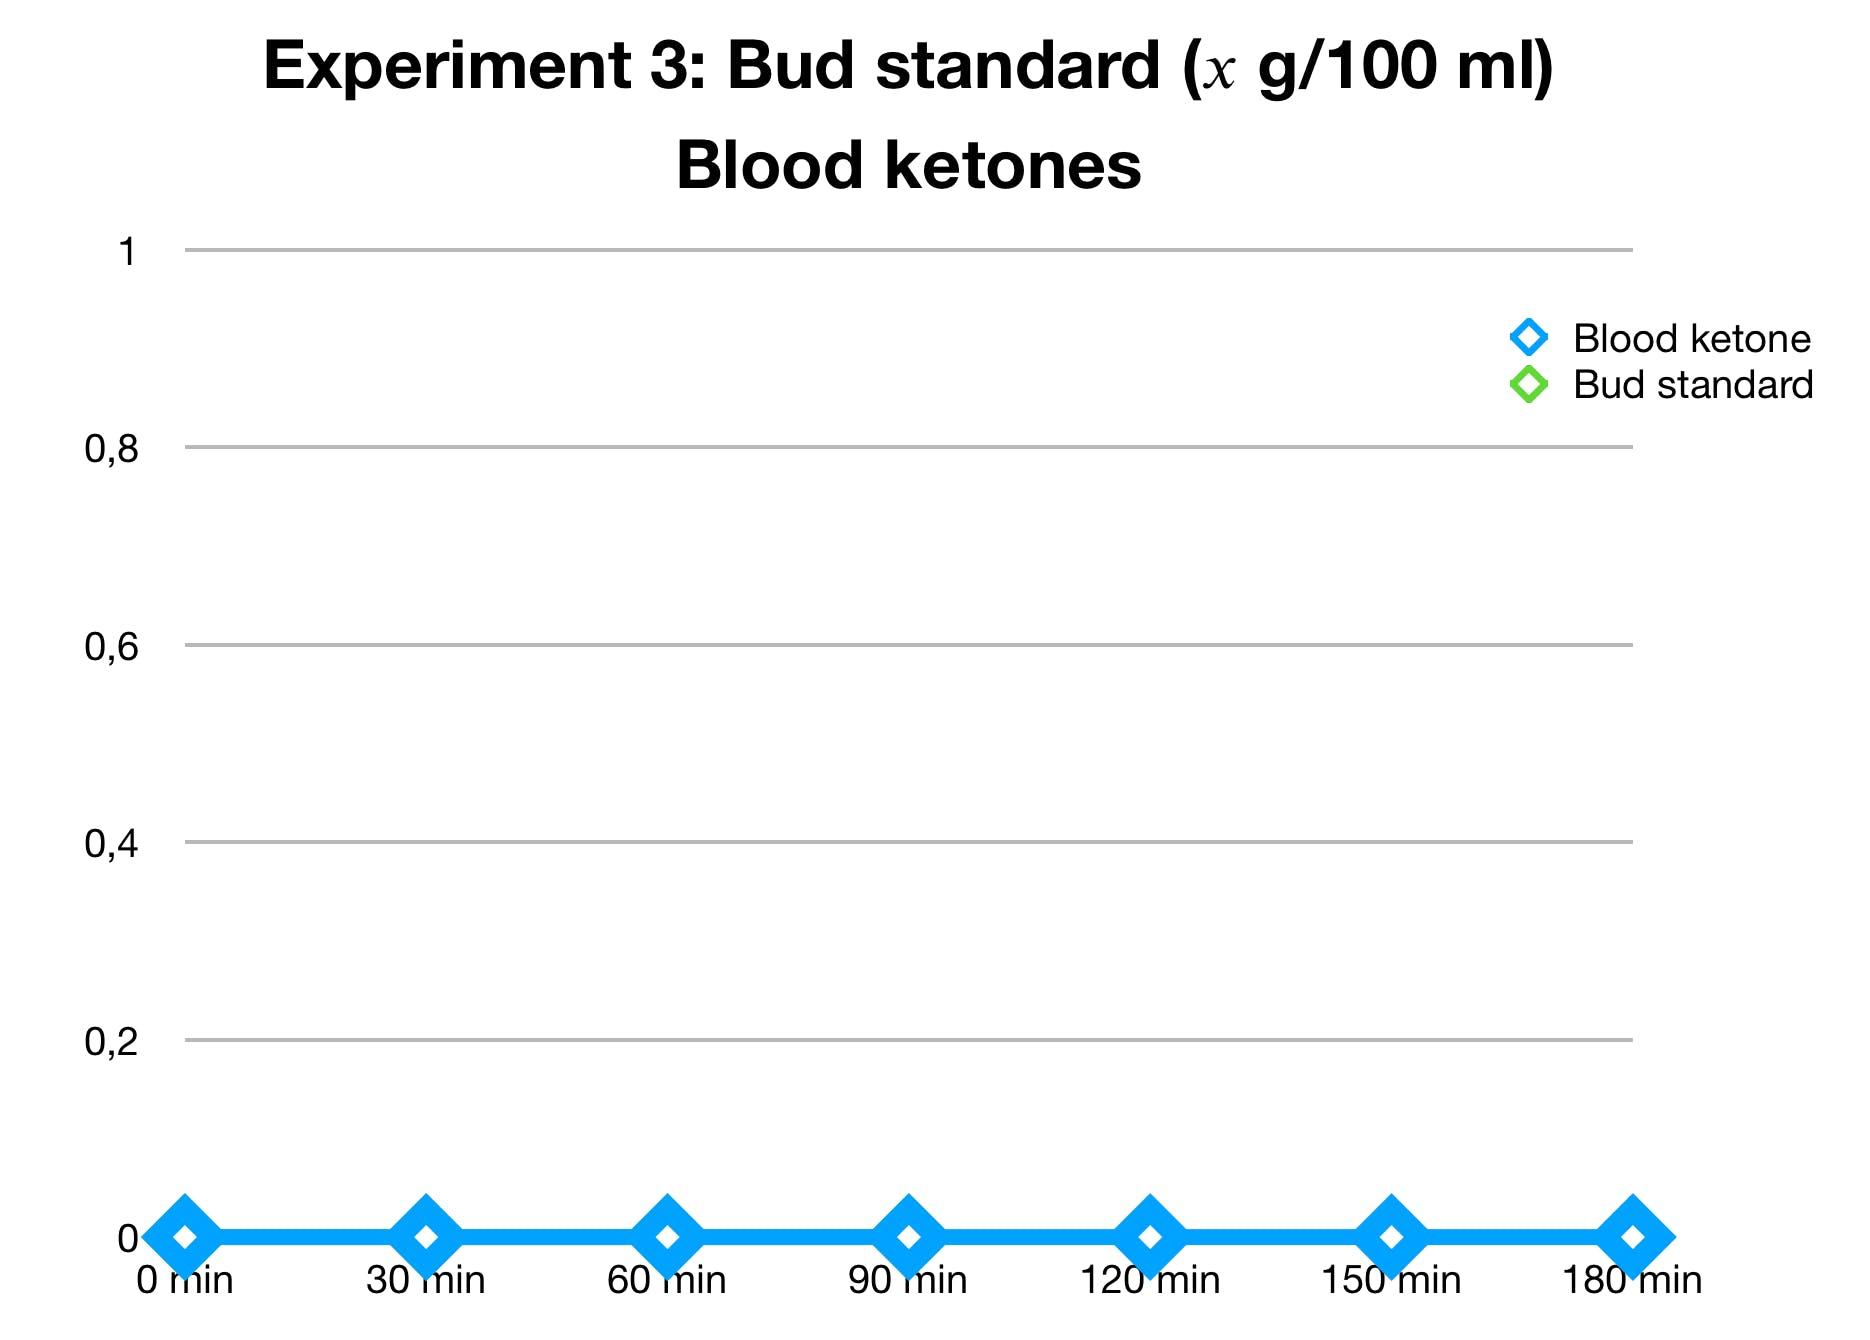 bud-standard-ketones